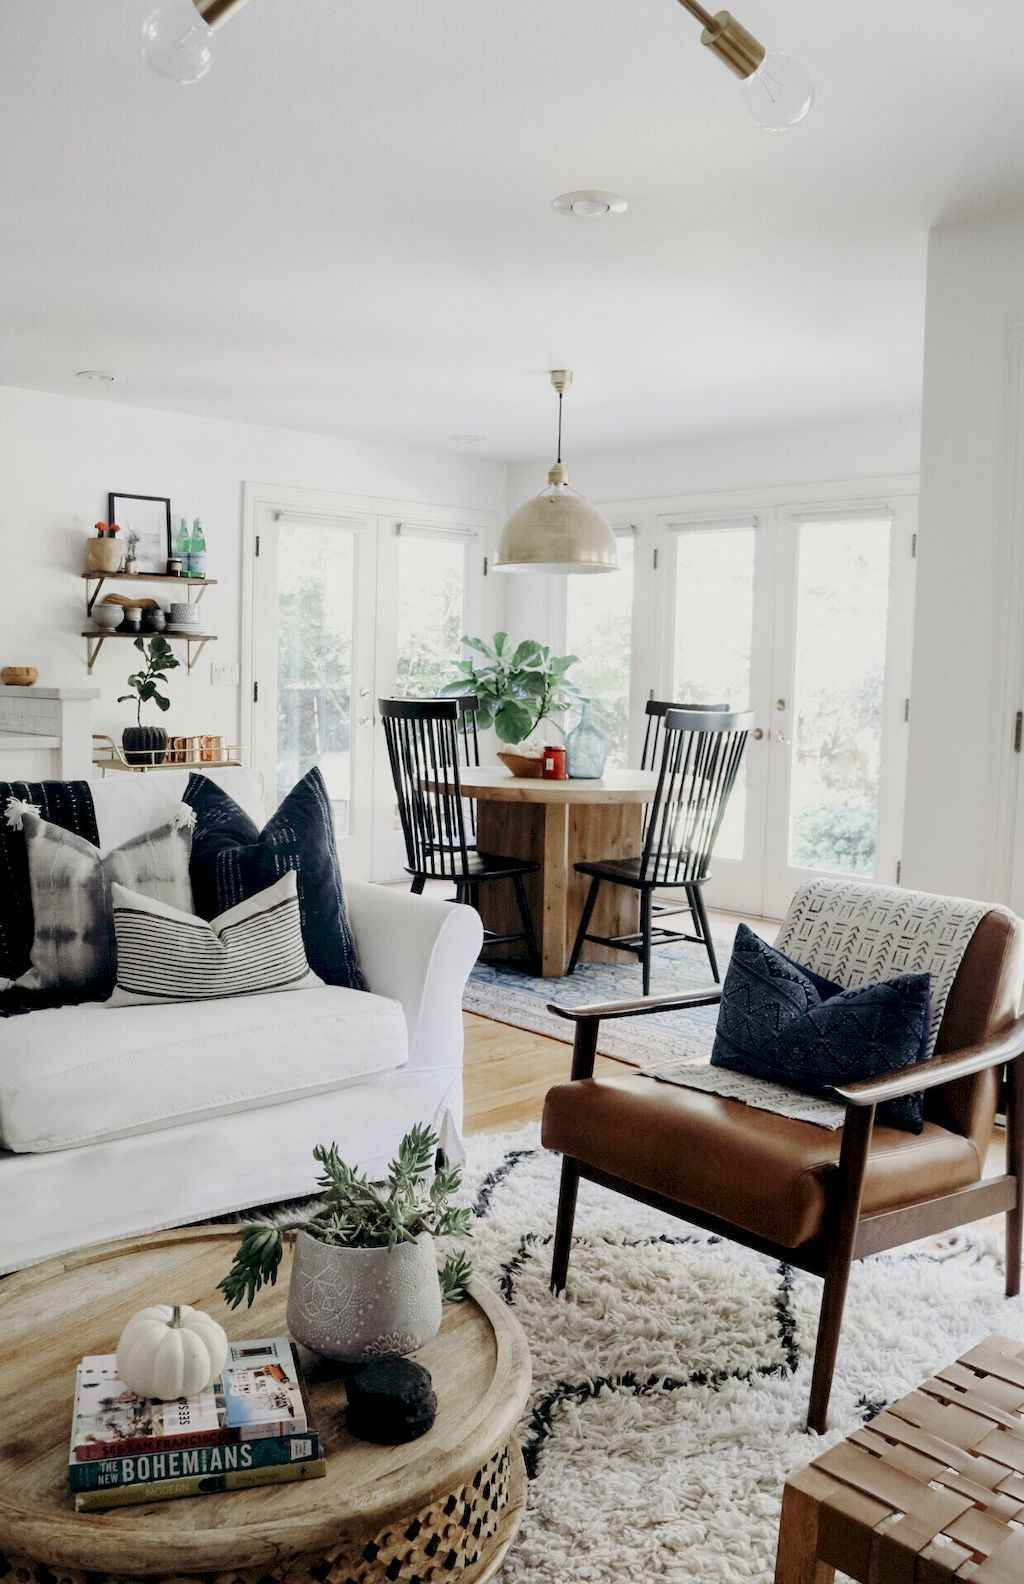 60 cool modern farmhouse living room decor ideas (1) - Roomadness.com